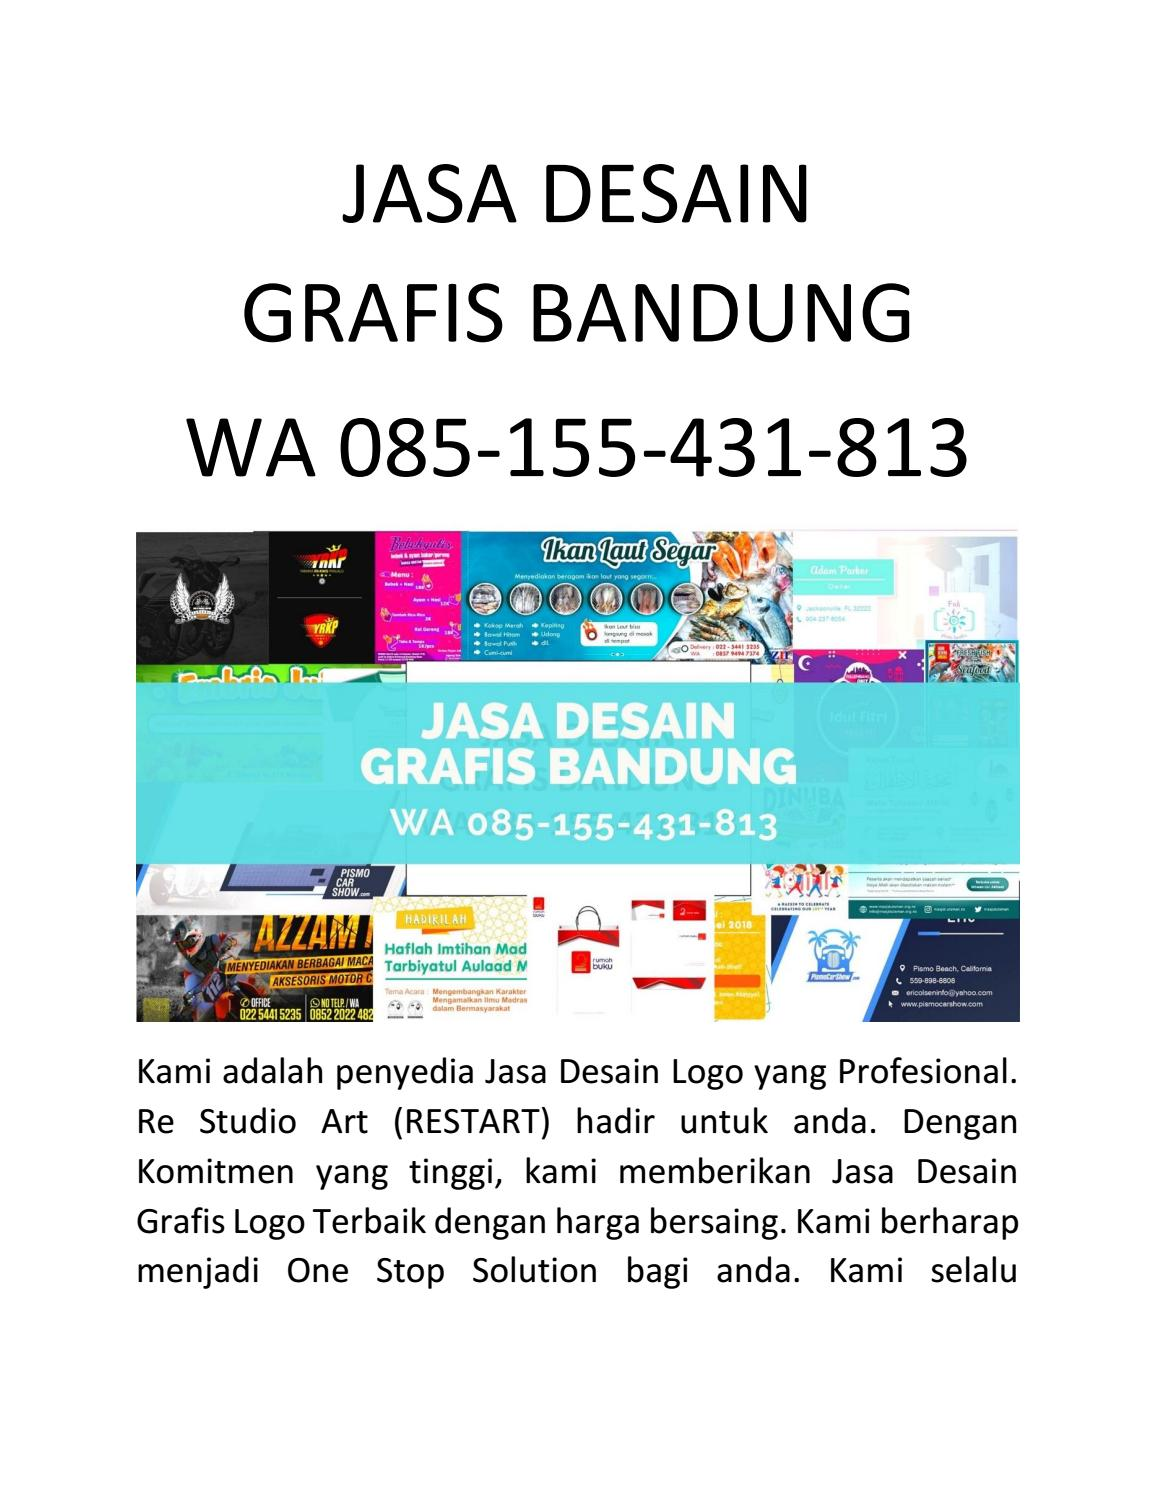 TERKENAL WA 10-10-10-10 Jasa Desain Bandung by